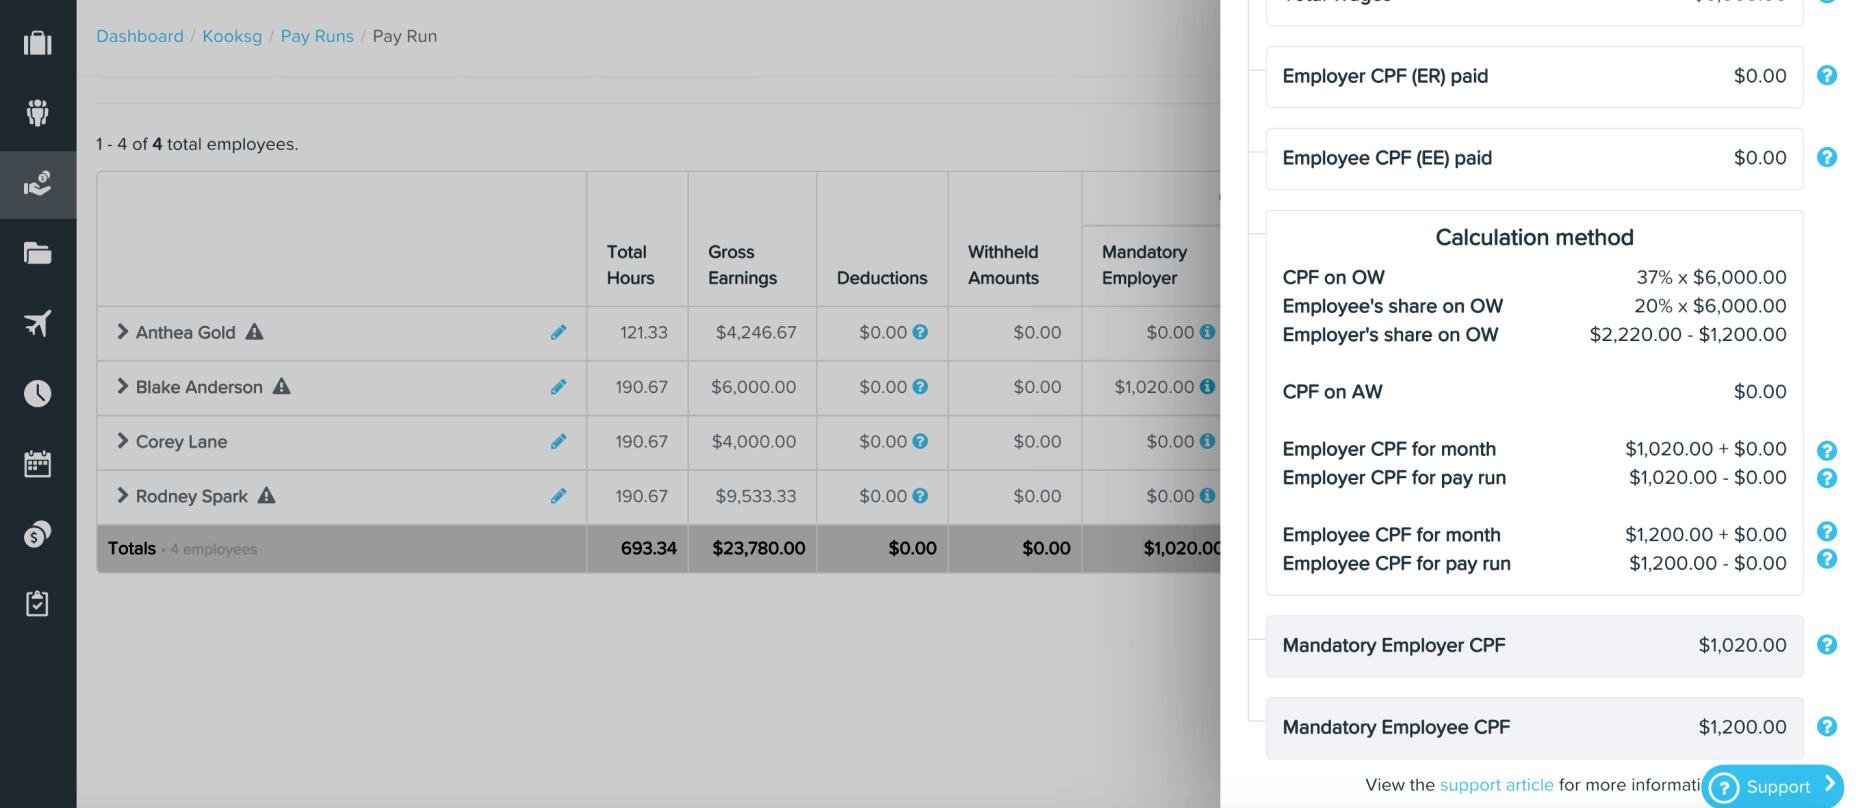 CPF calculations